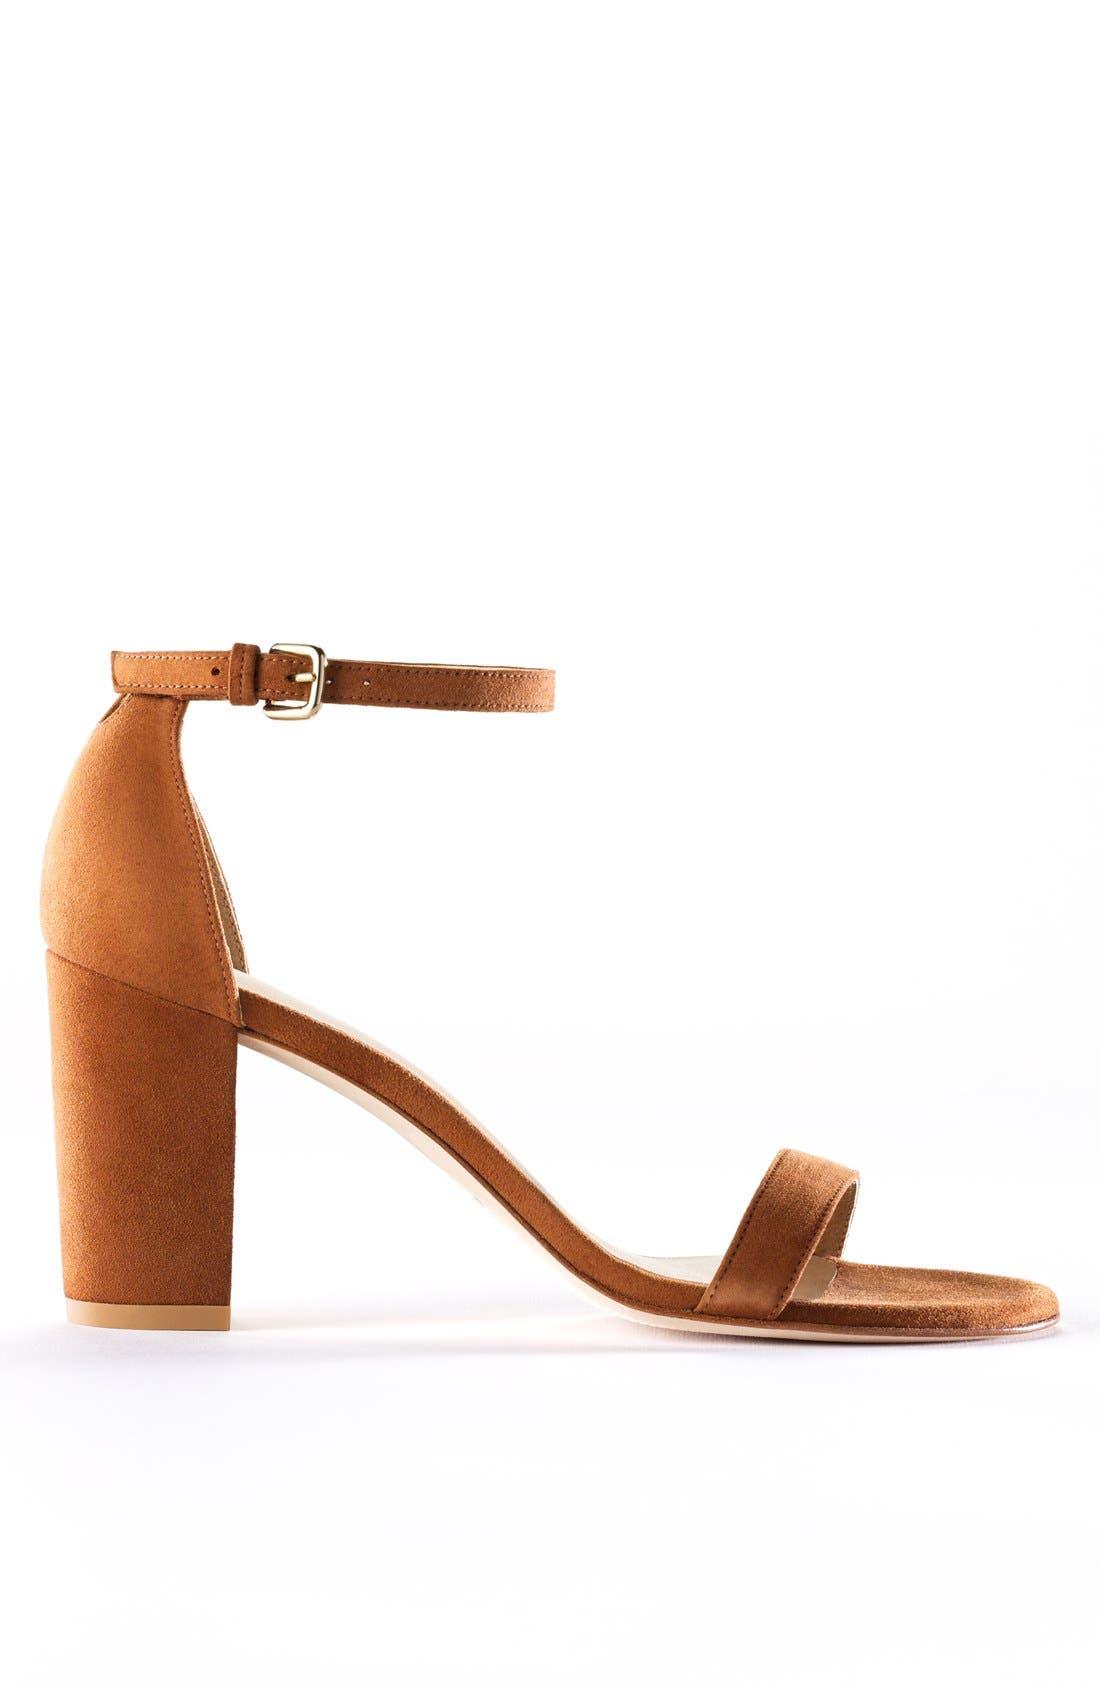 Simple Ankle Strap Sandal,                             Alternate thumbnail 10, color,                             BLACK SUEDE